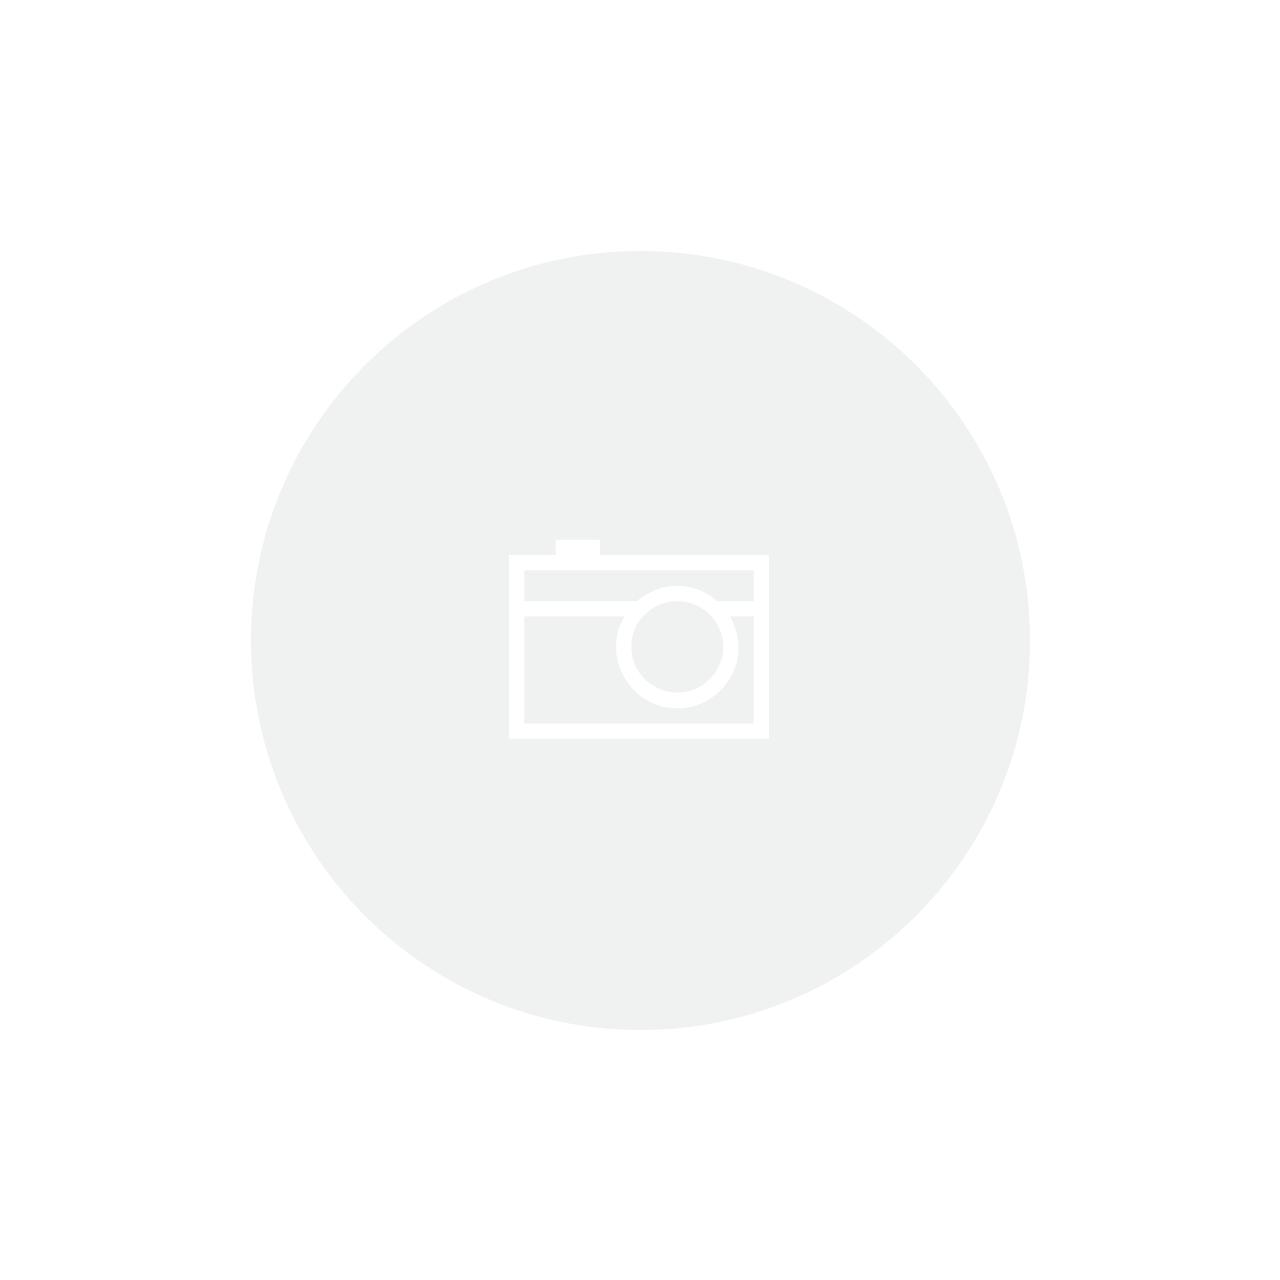 Sakura Japan Women's Wine Awards PRATA